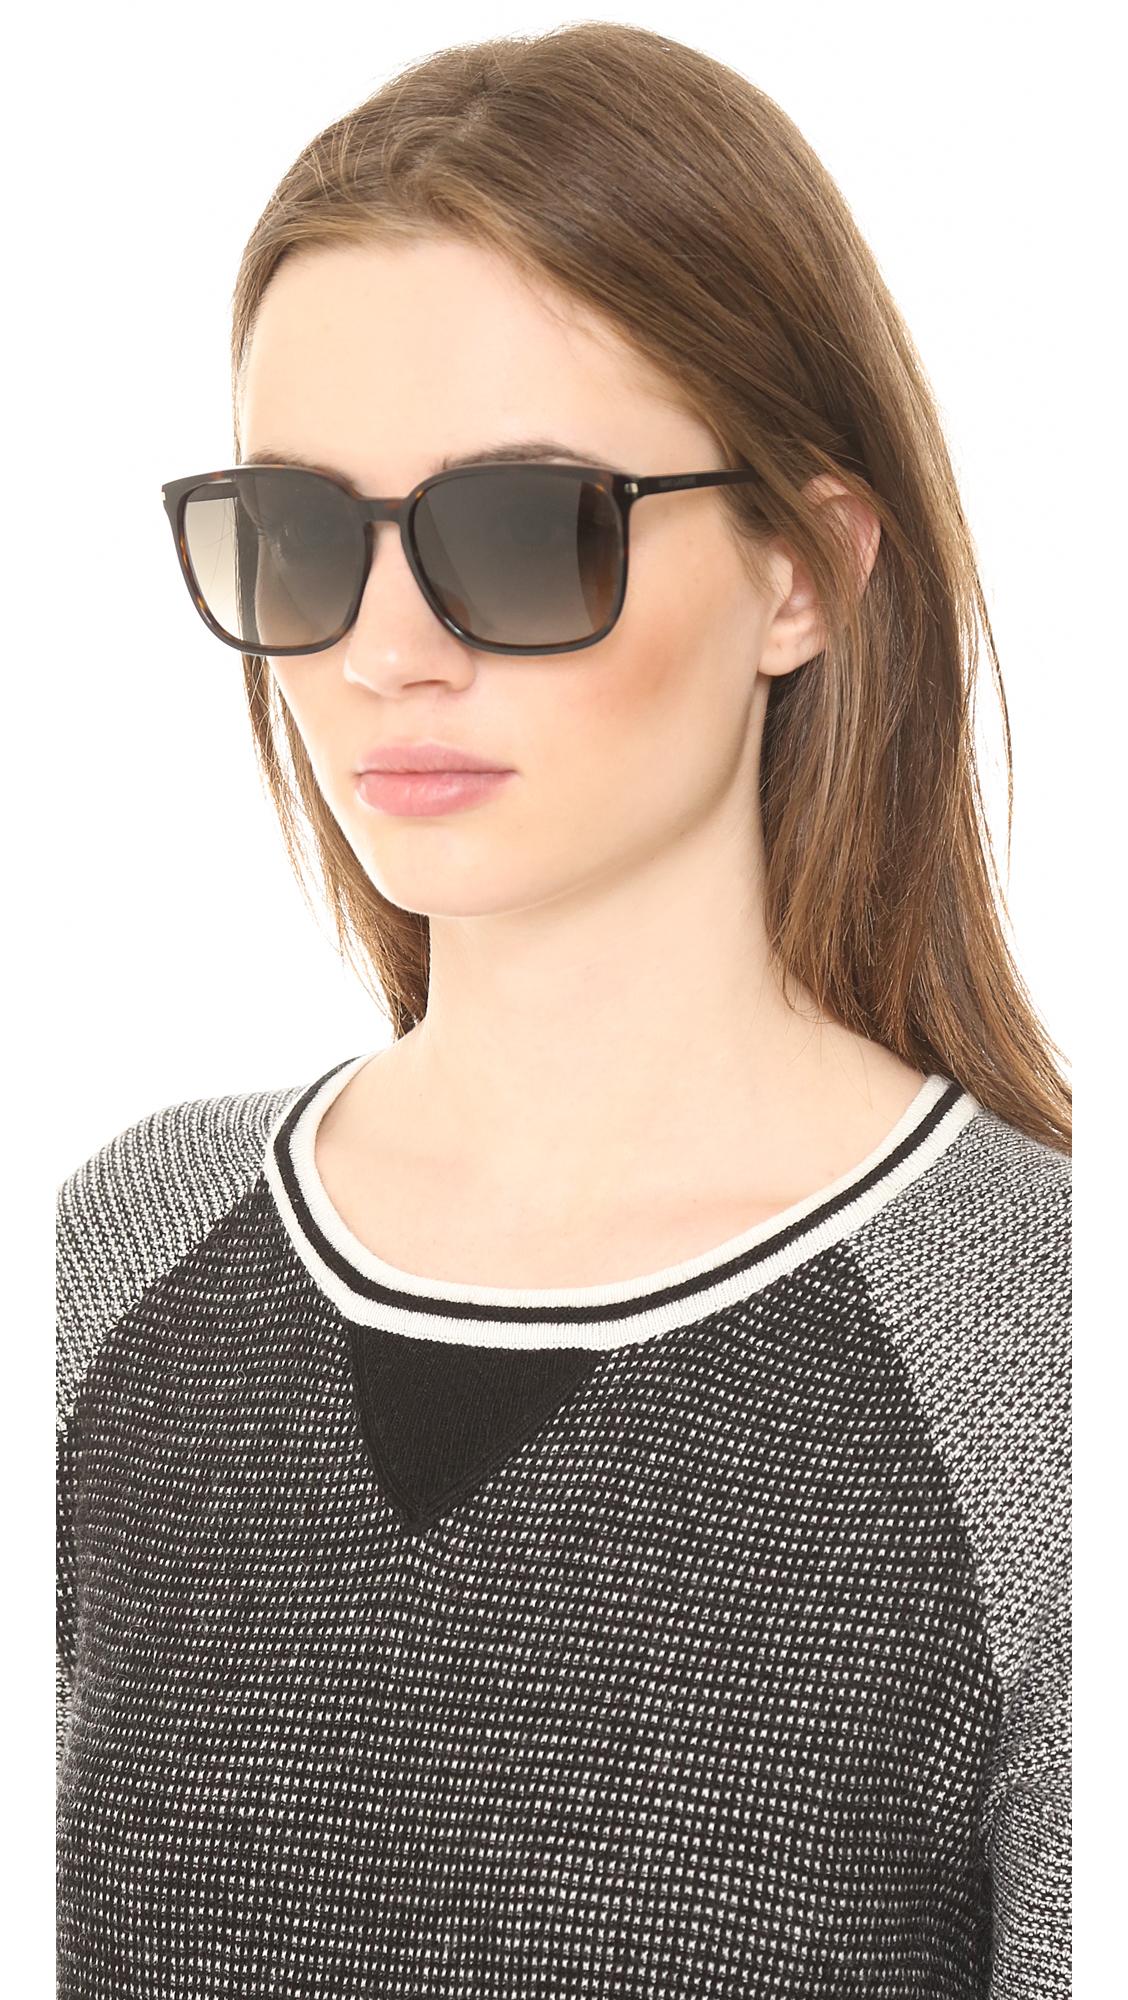 bff1369569 Lyst - Saint Laurent Slim Square Sunglasses - White Brown Gradient in Brown